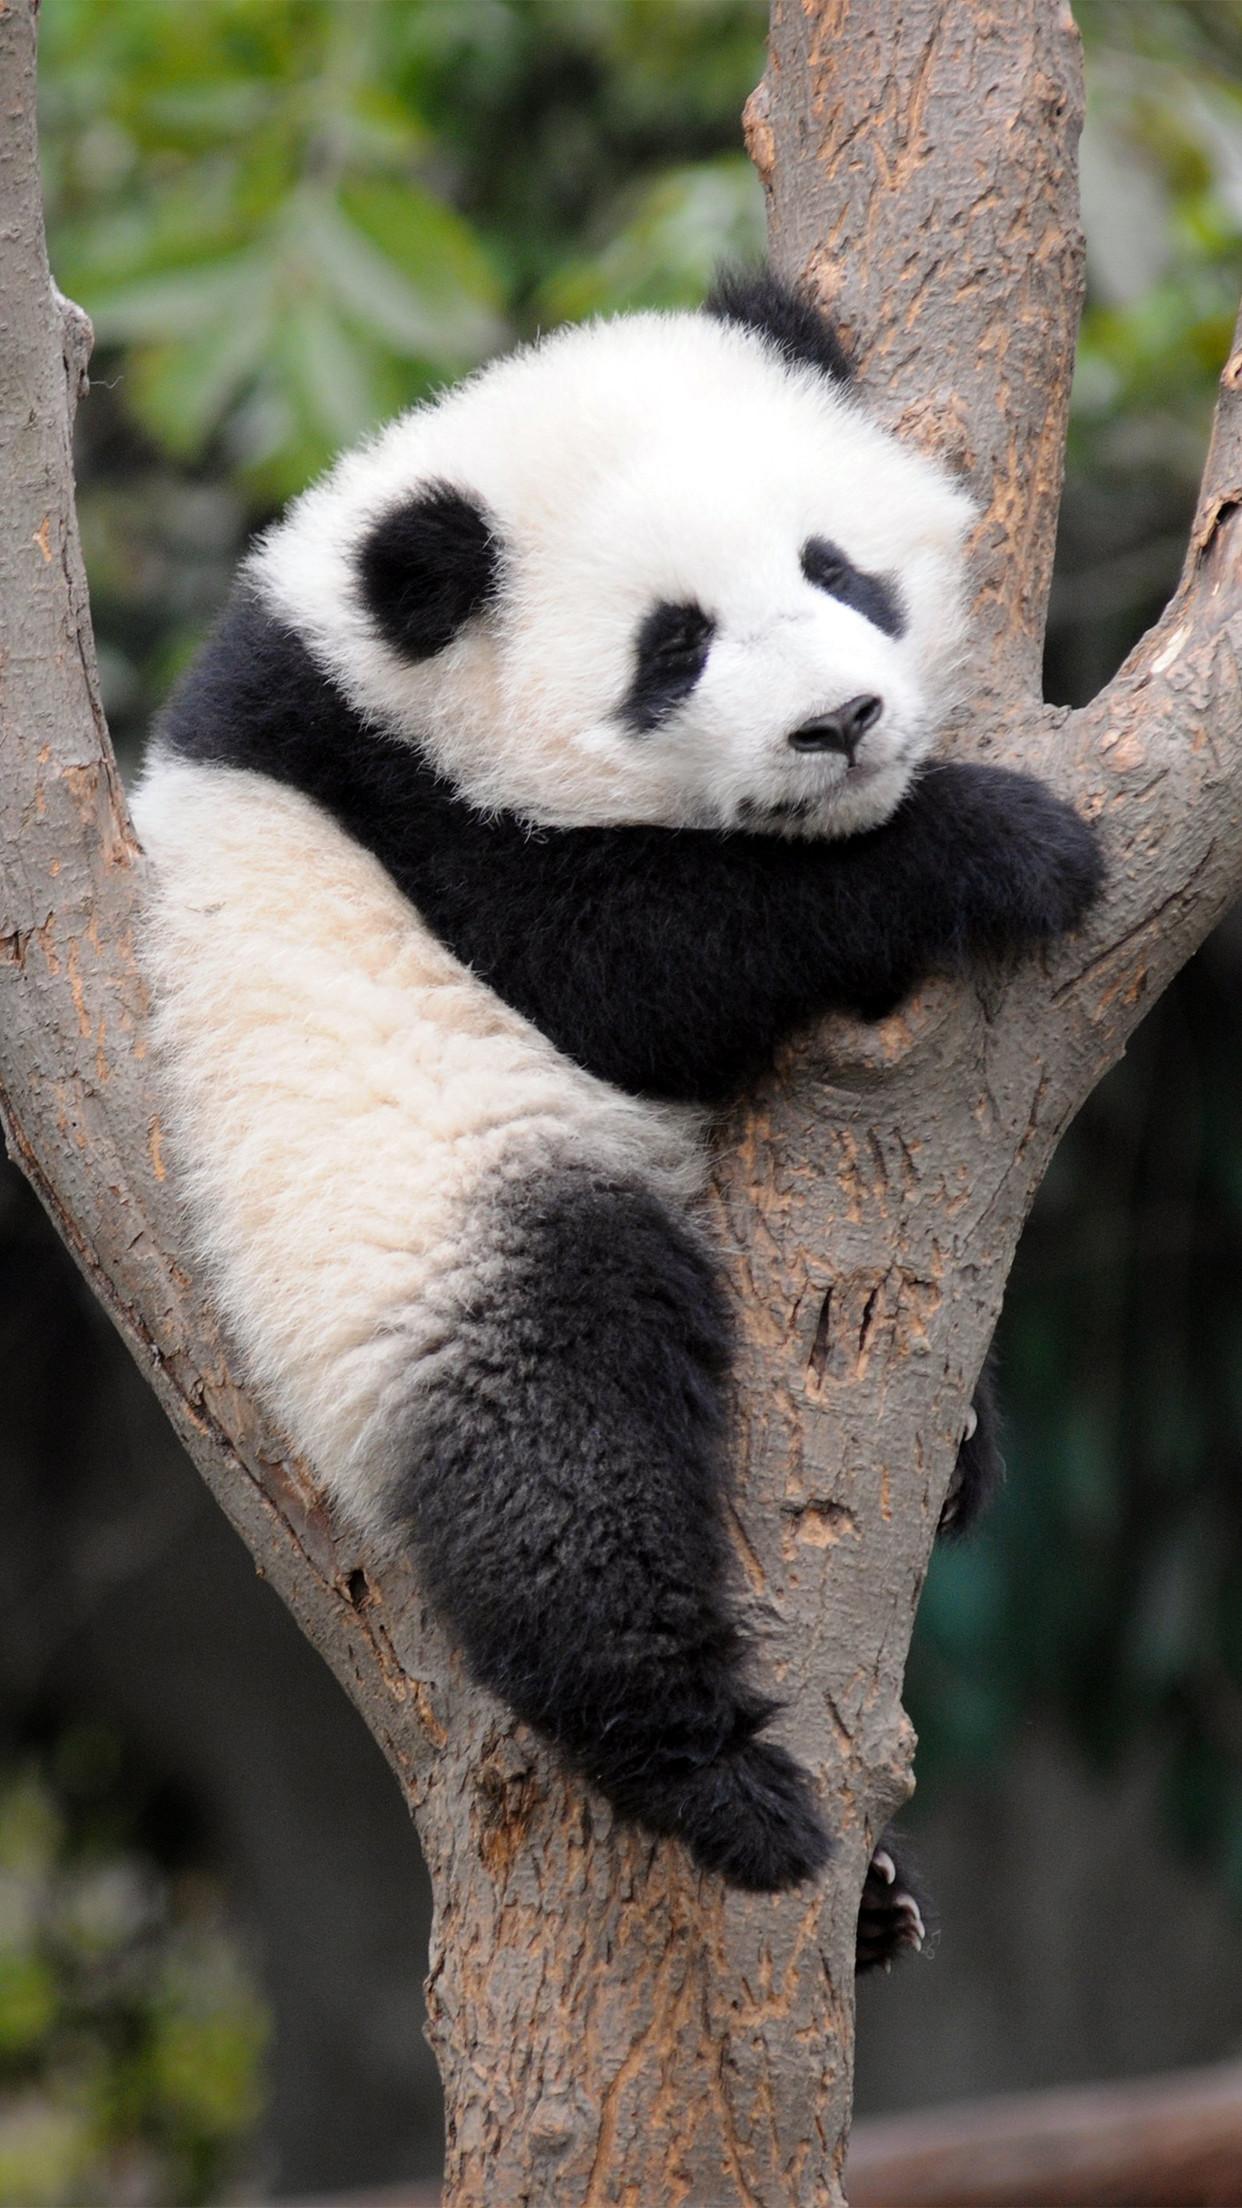 Panda-sleeping-3Wallpapers-iPhone-Parallax